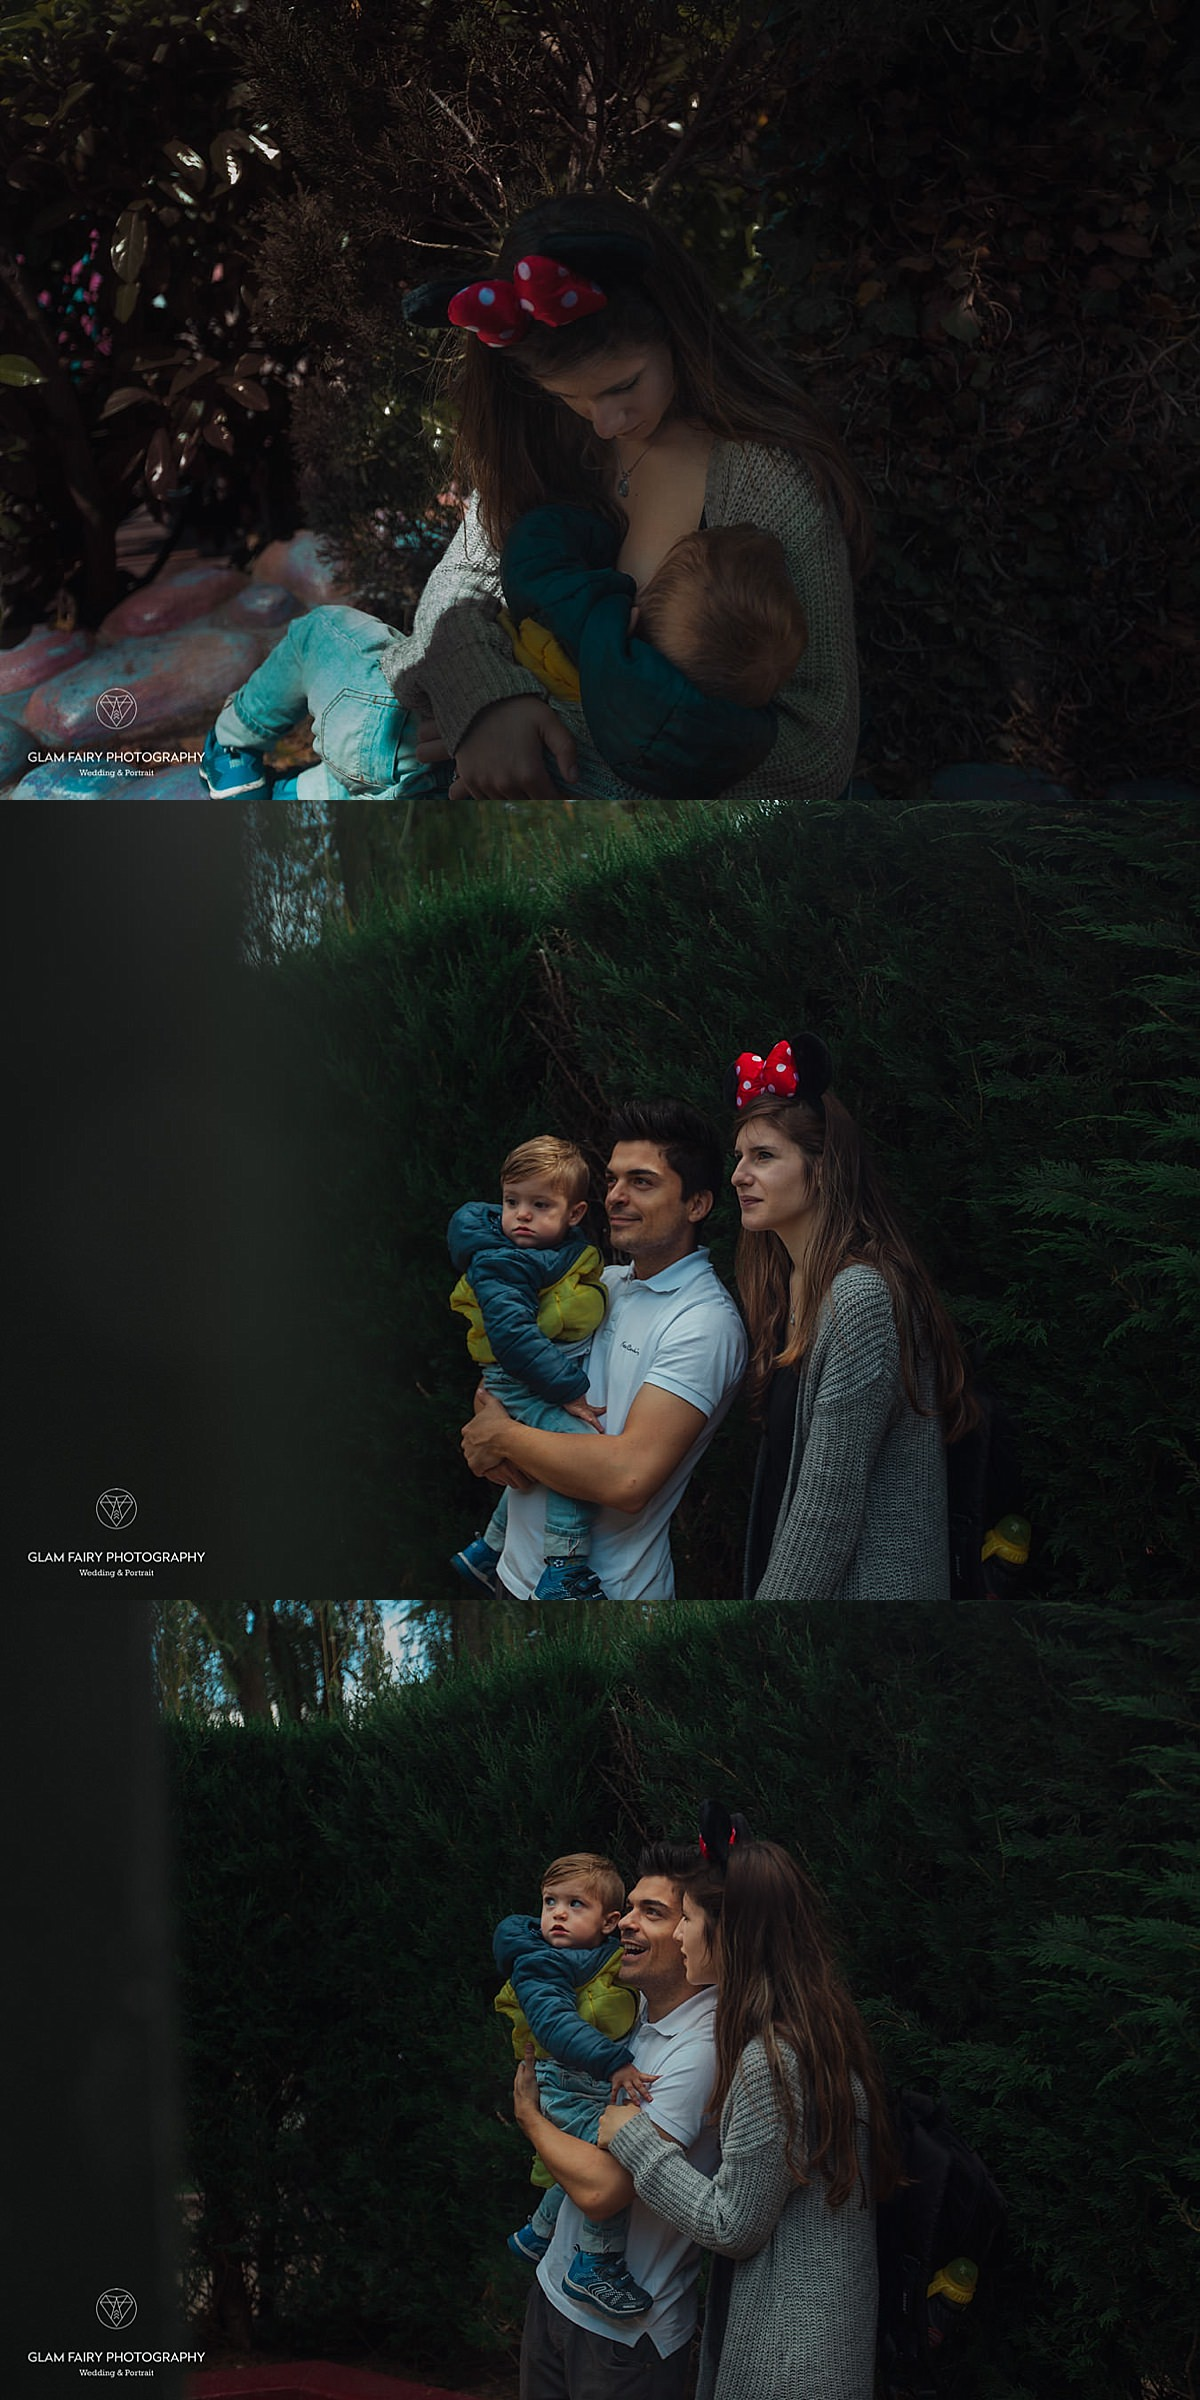 GlamFairyPhotography-seance-couple-et-famille-a-disneyland-paris-roberta_0018